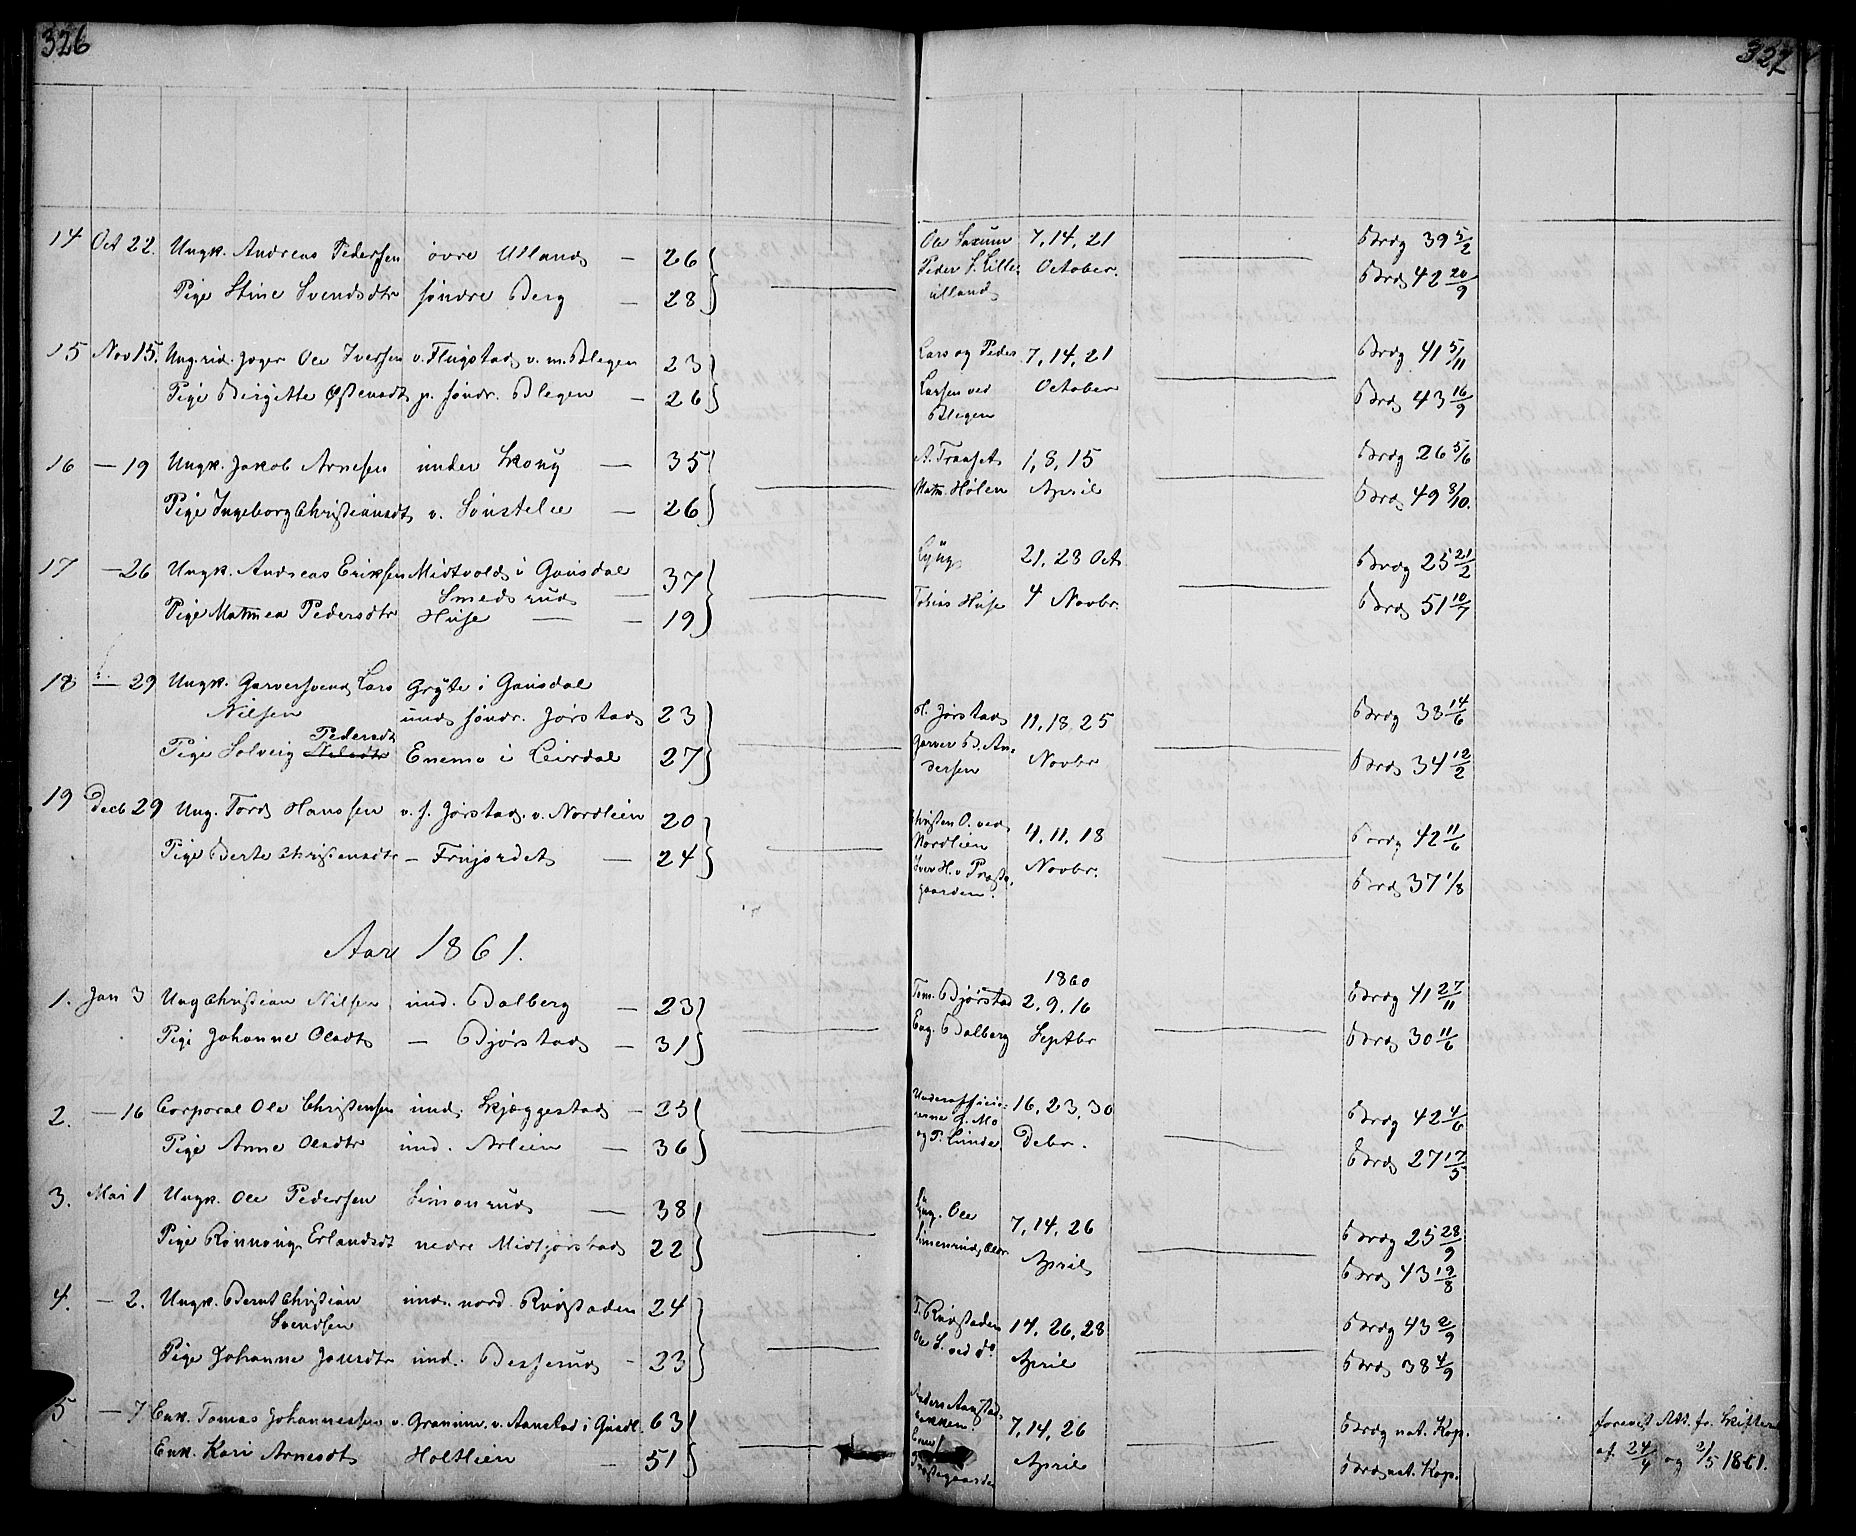 SAH, Fåberg prestekontor, Klokkerbok nr. 5, 1837-1864, s. 326-327